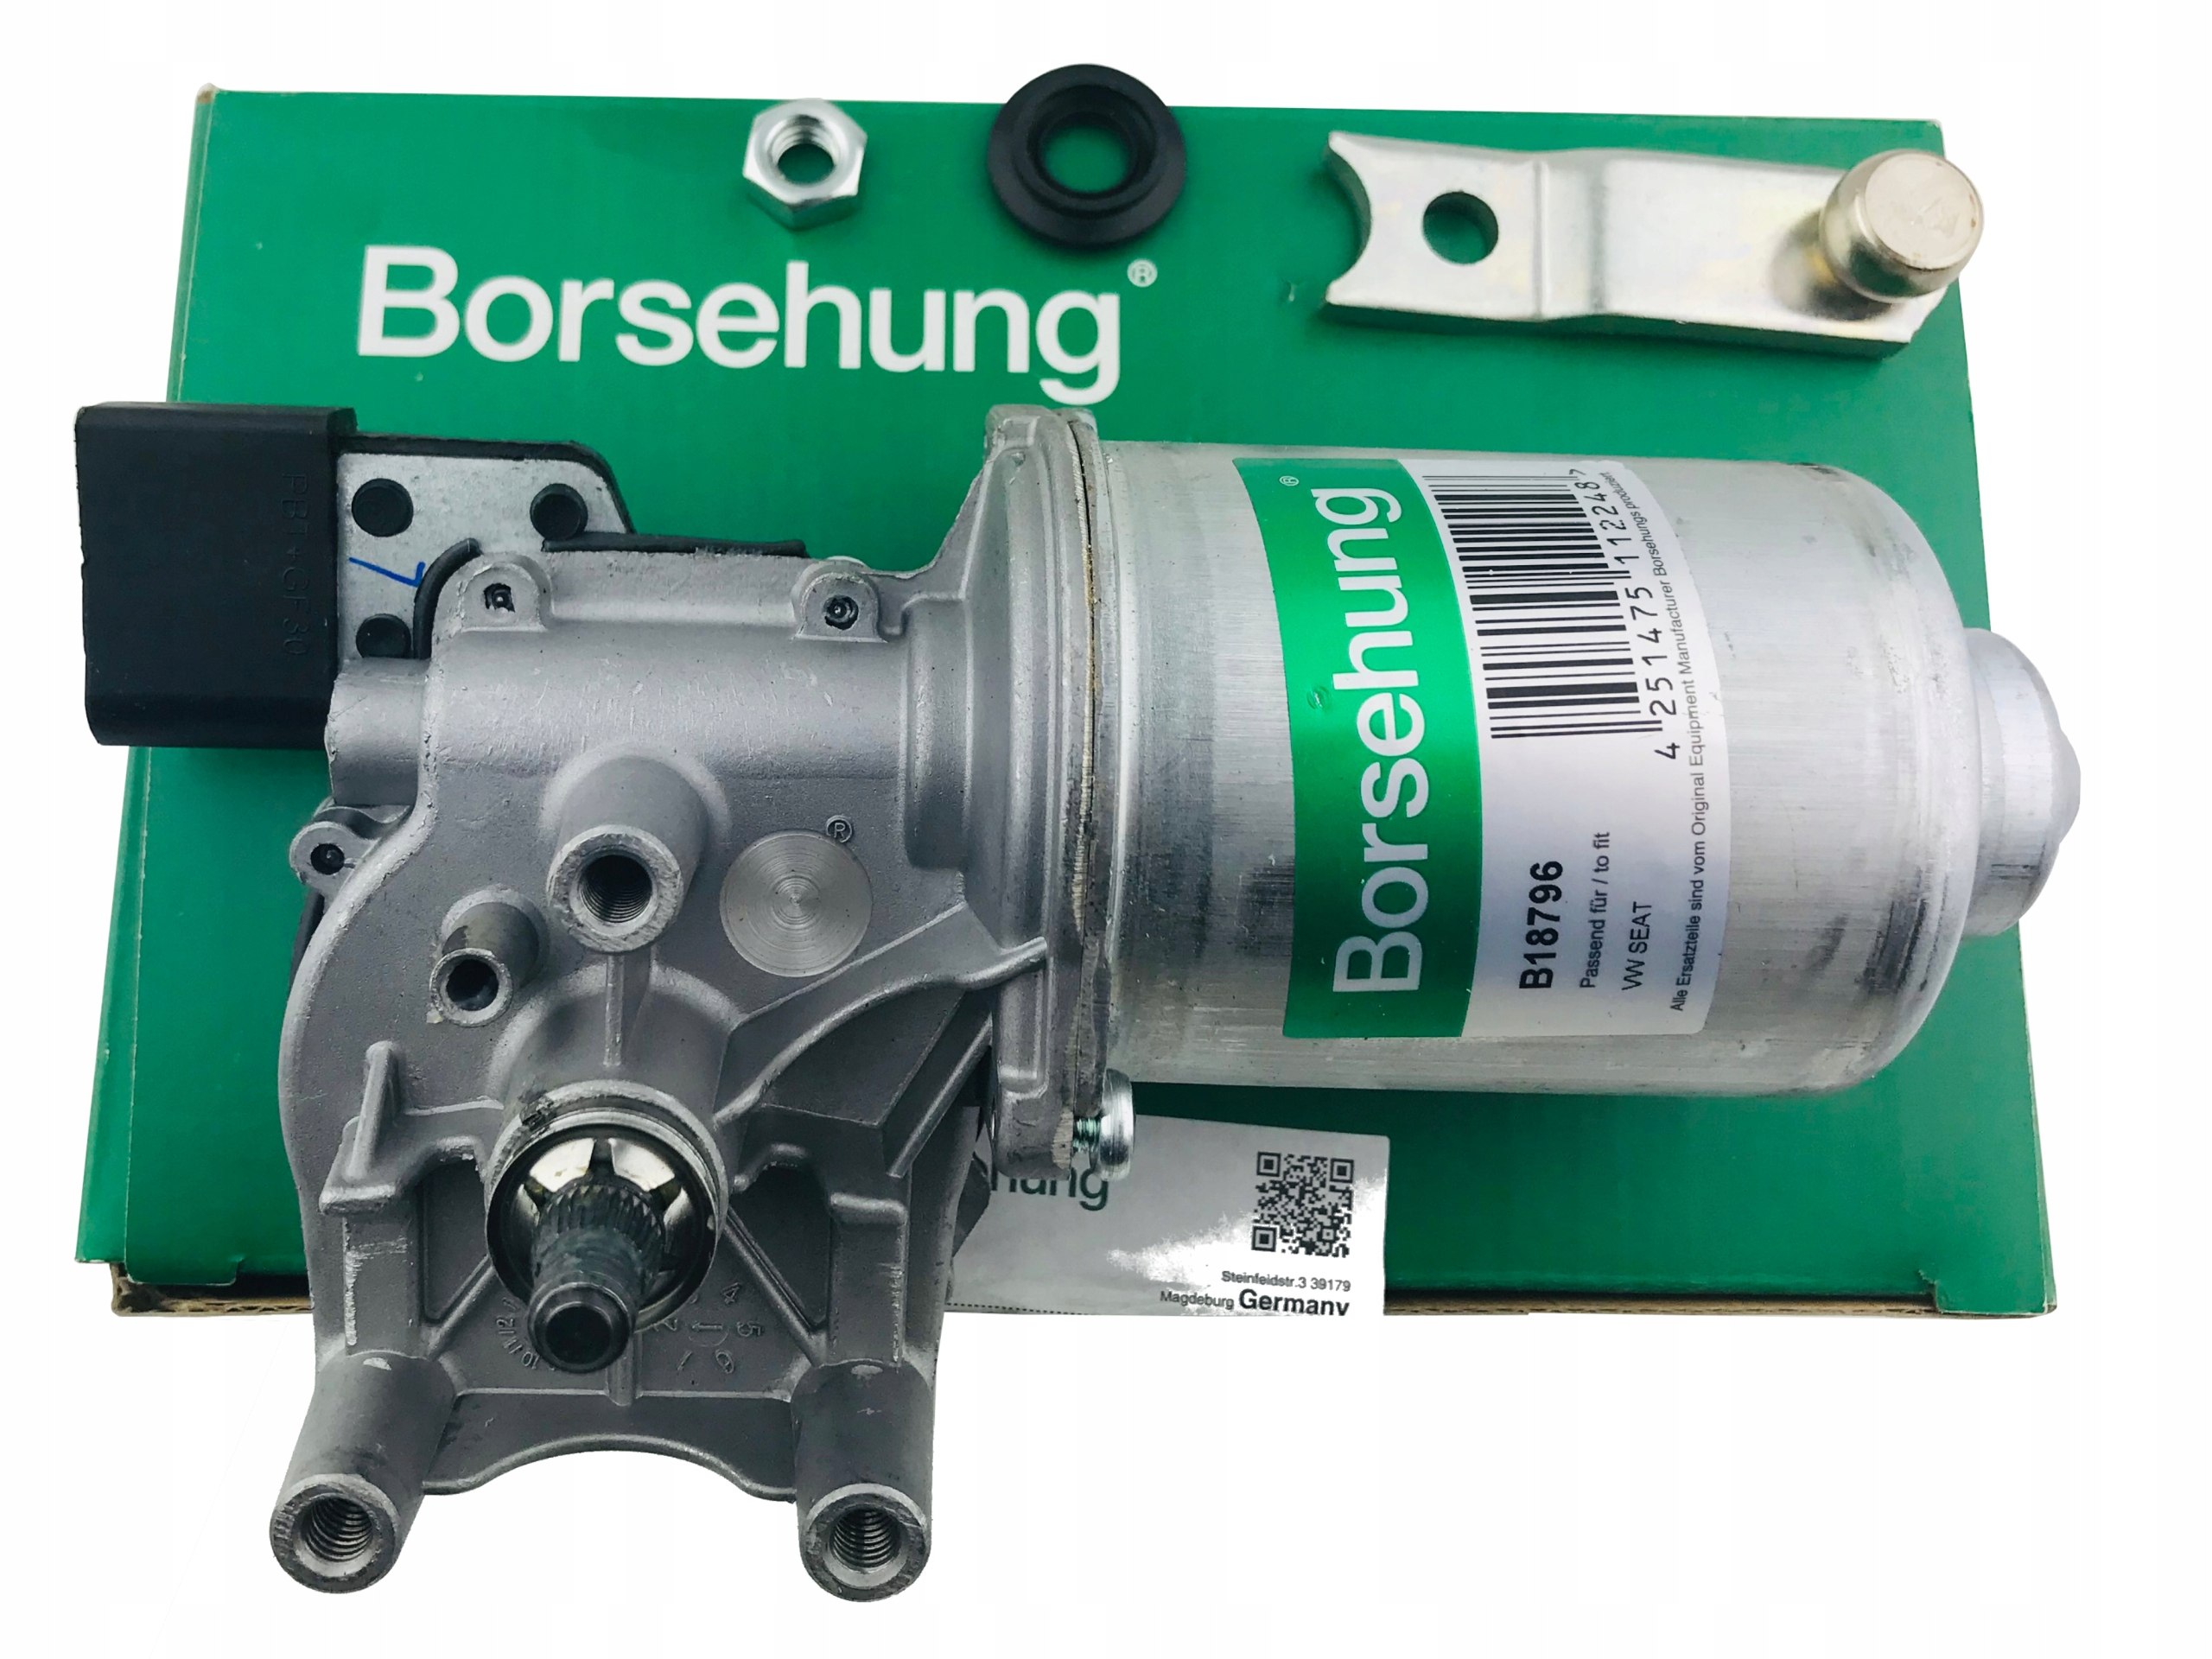 двигатель стеклоочистителя привод vw jetta iv 11- 5c6955121